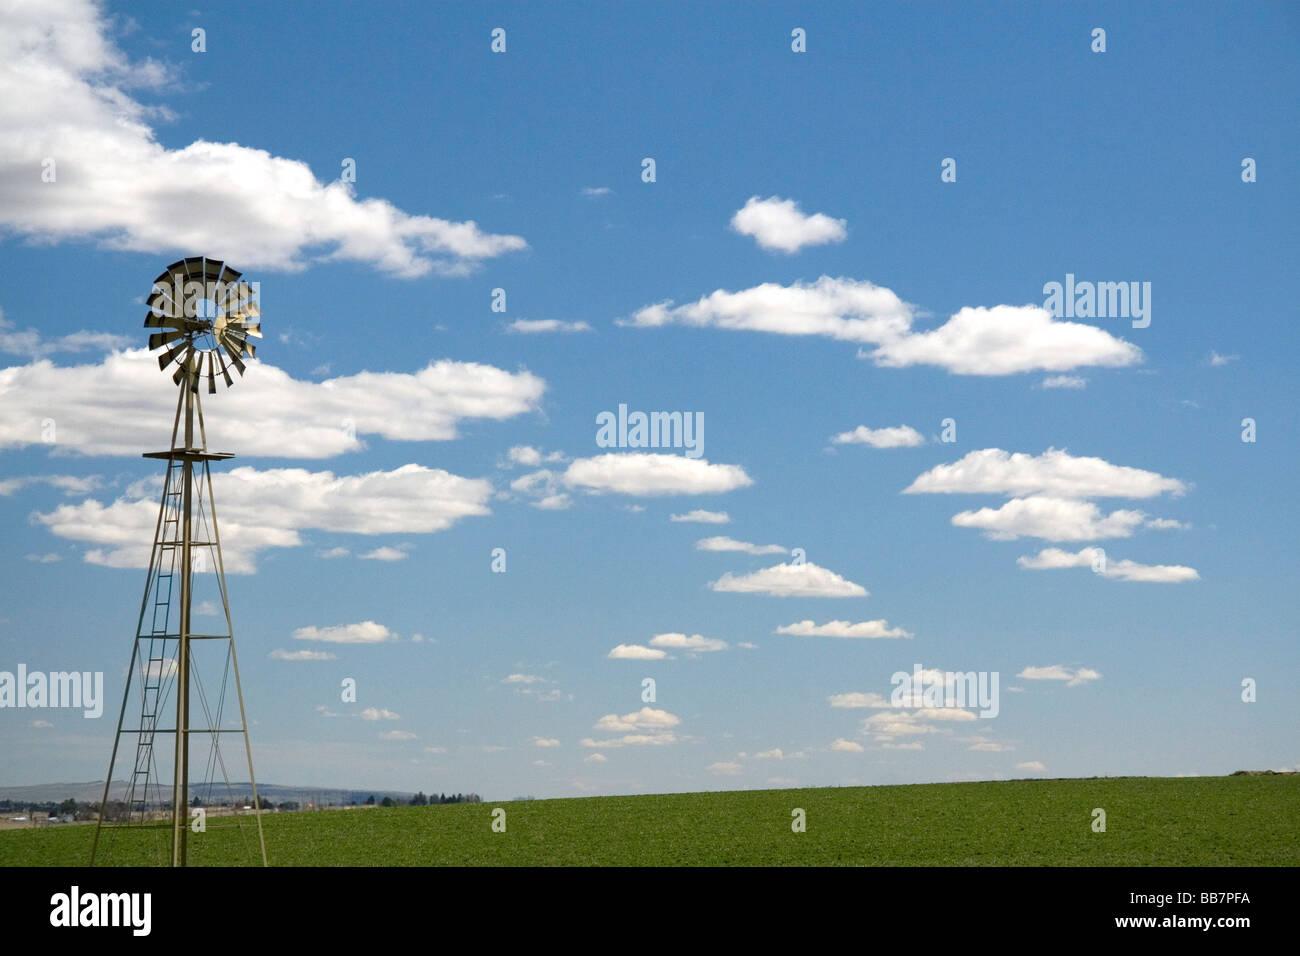 Windmill on a farm in Canyon County Idaho USA - Stock Image